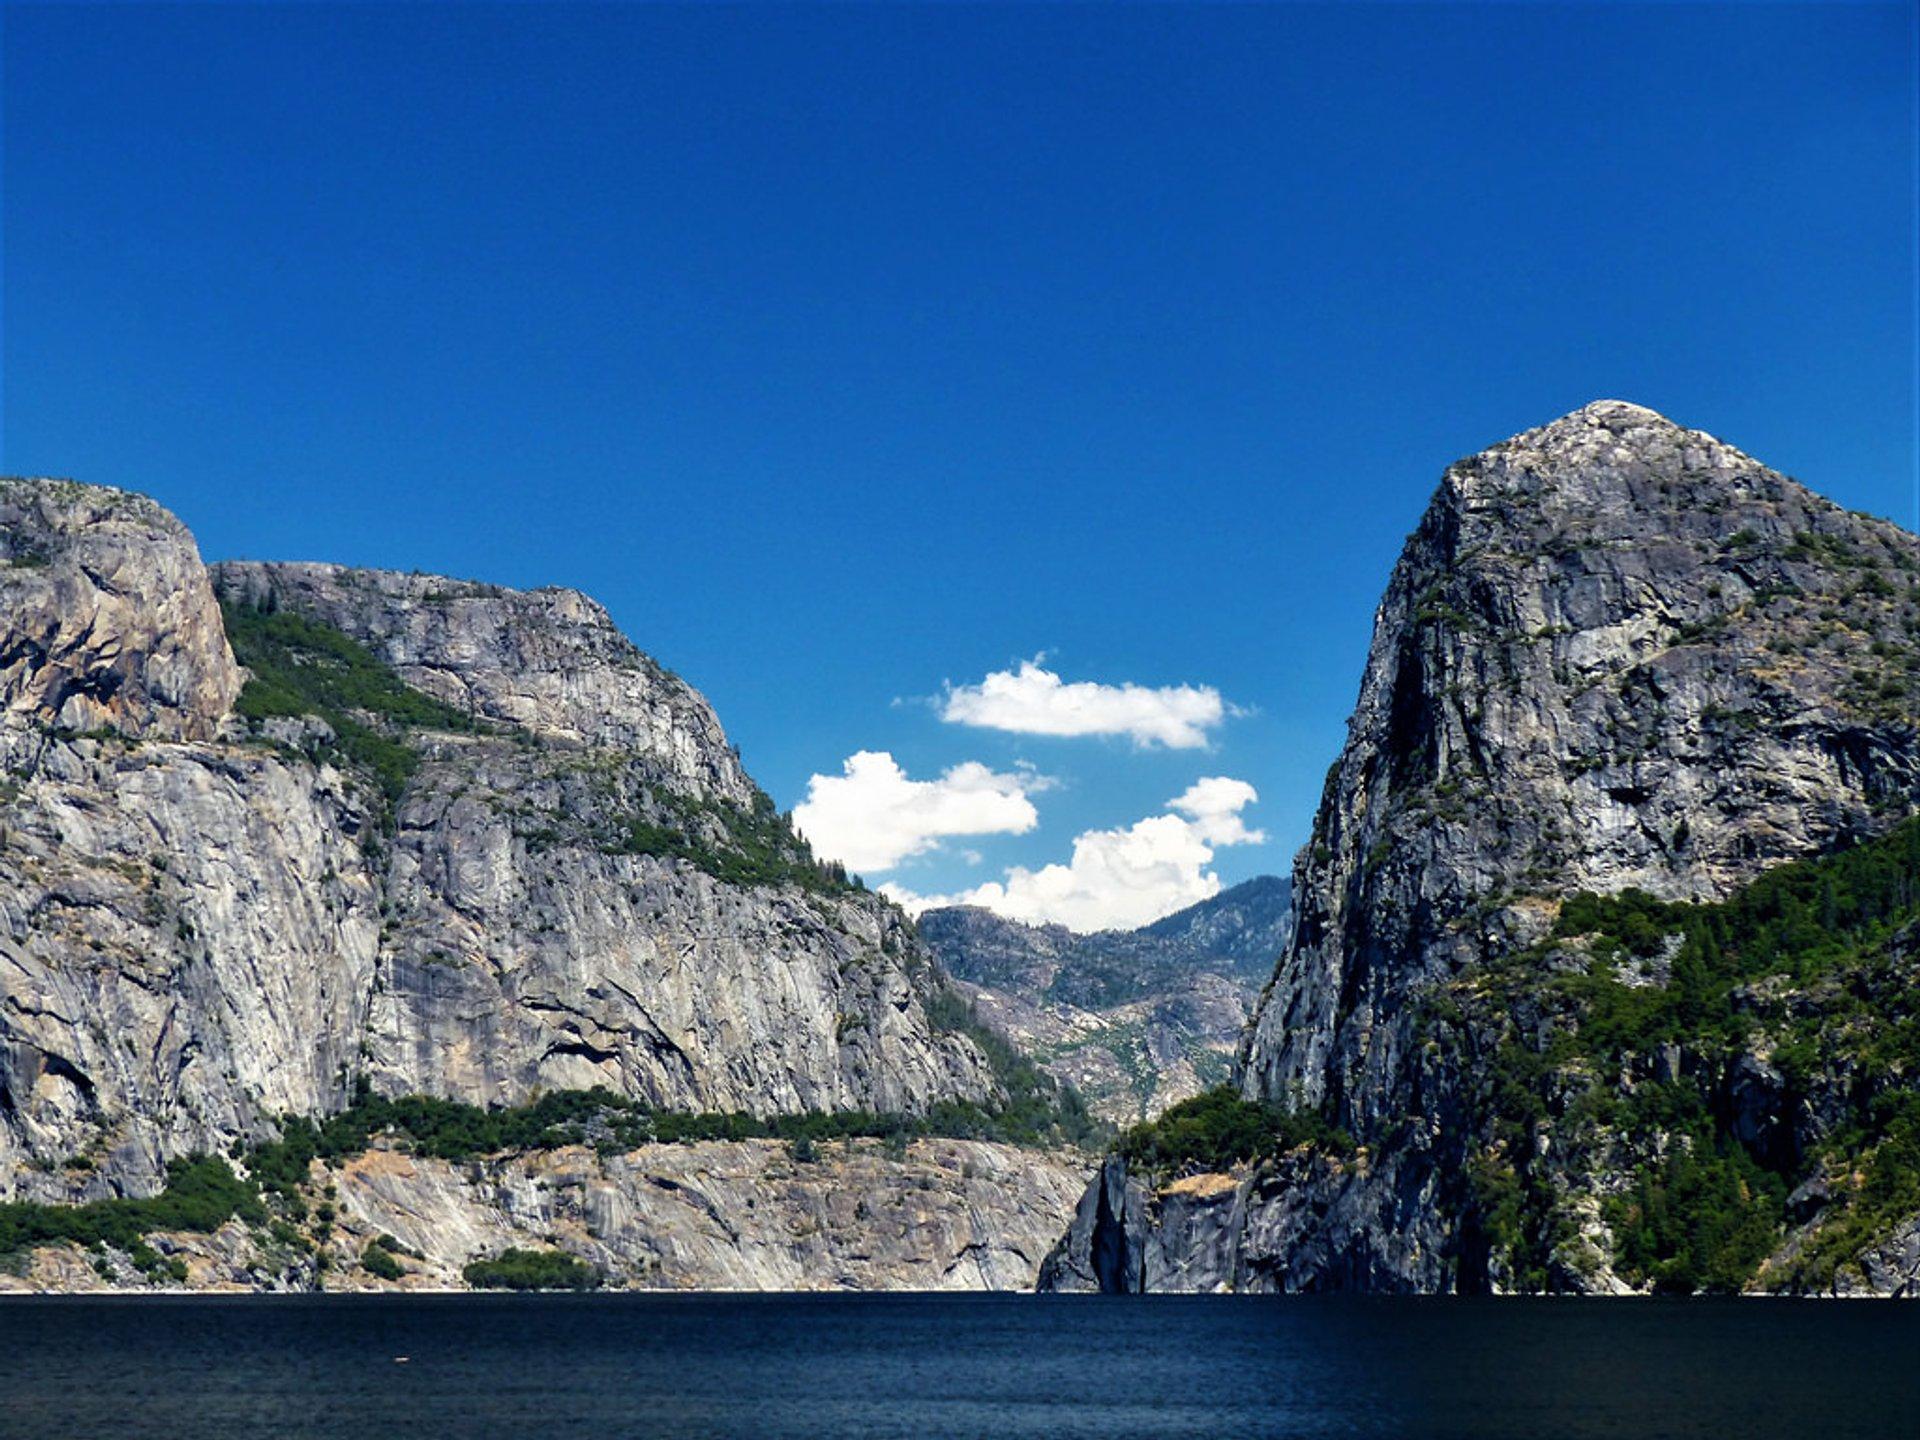 Hetch Hetchy Valley in Yosemite 2020 - Best Time